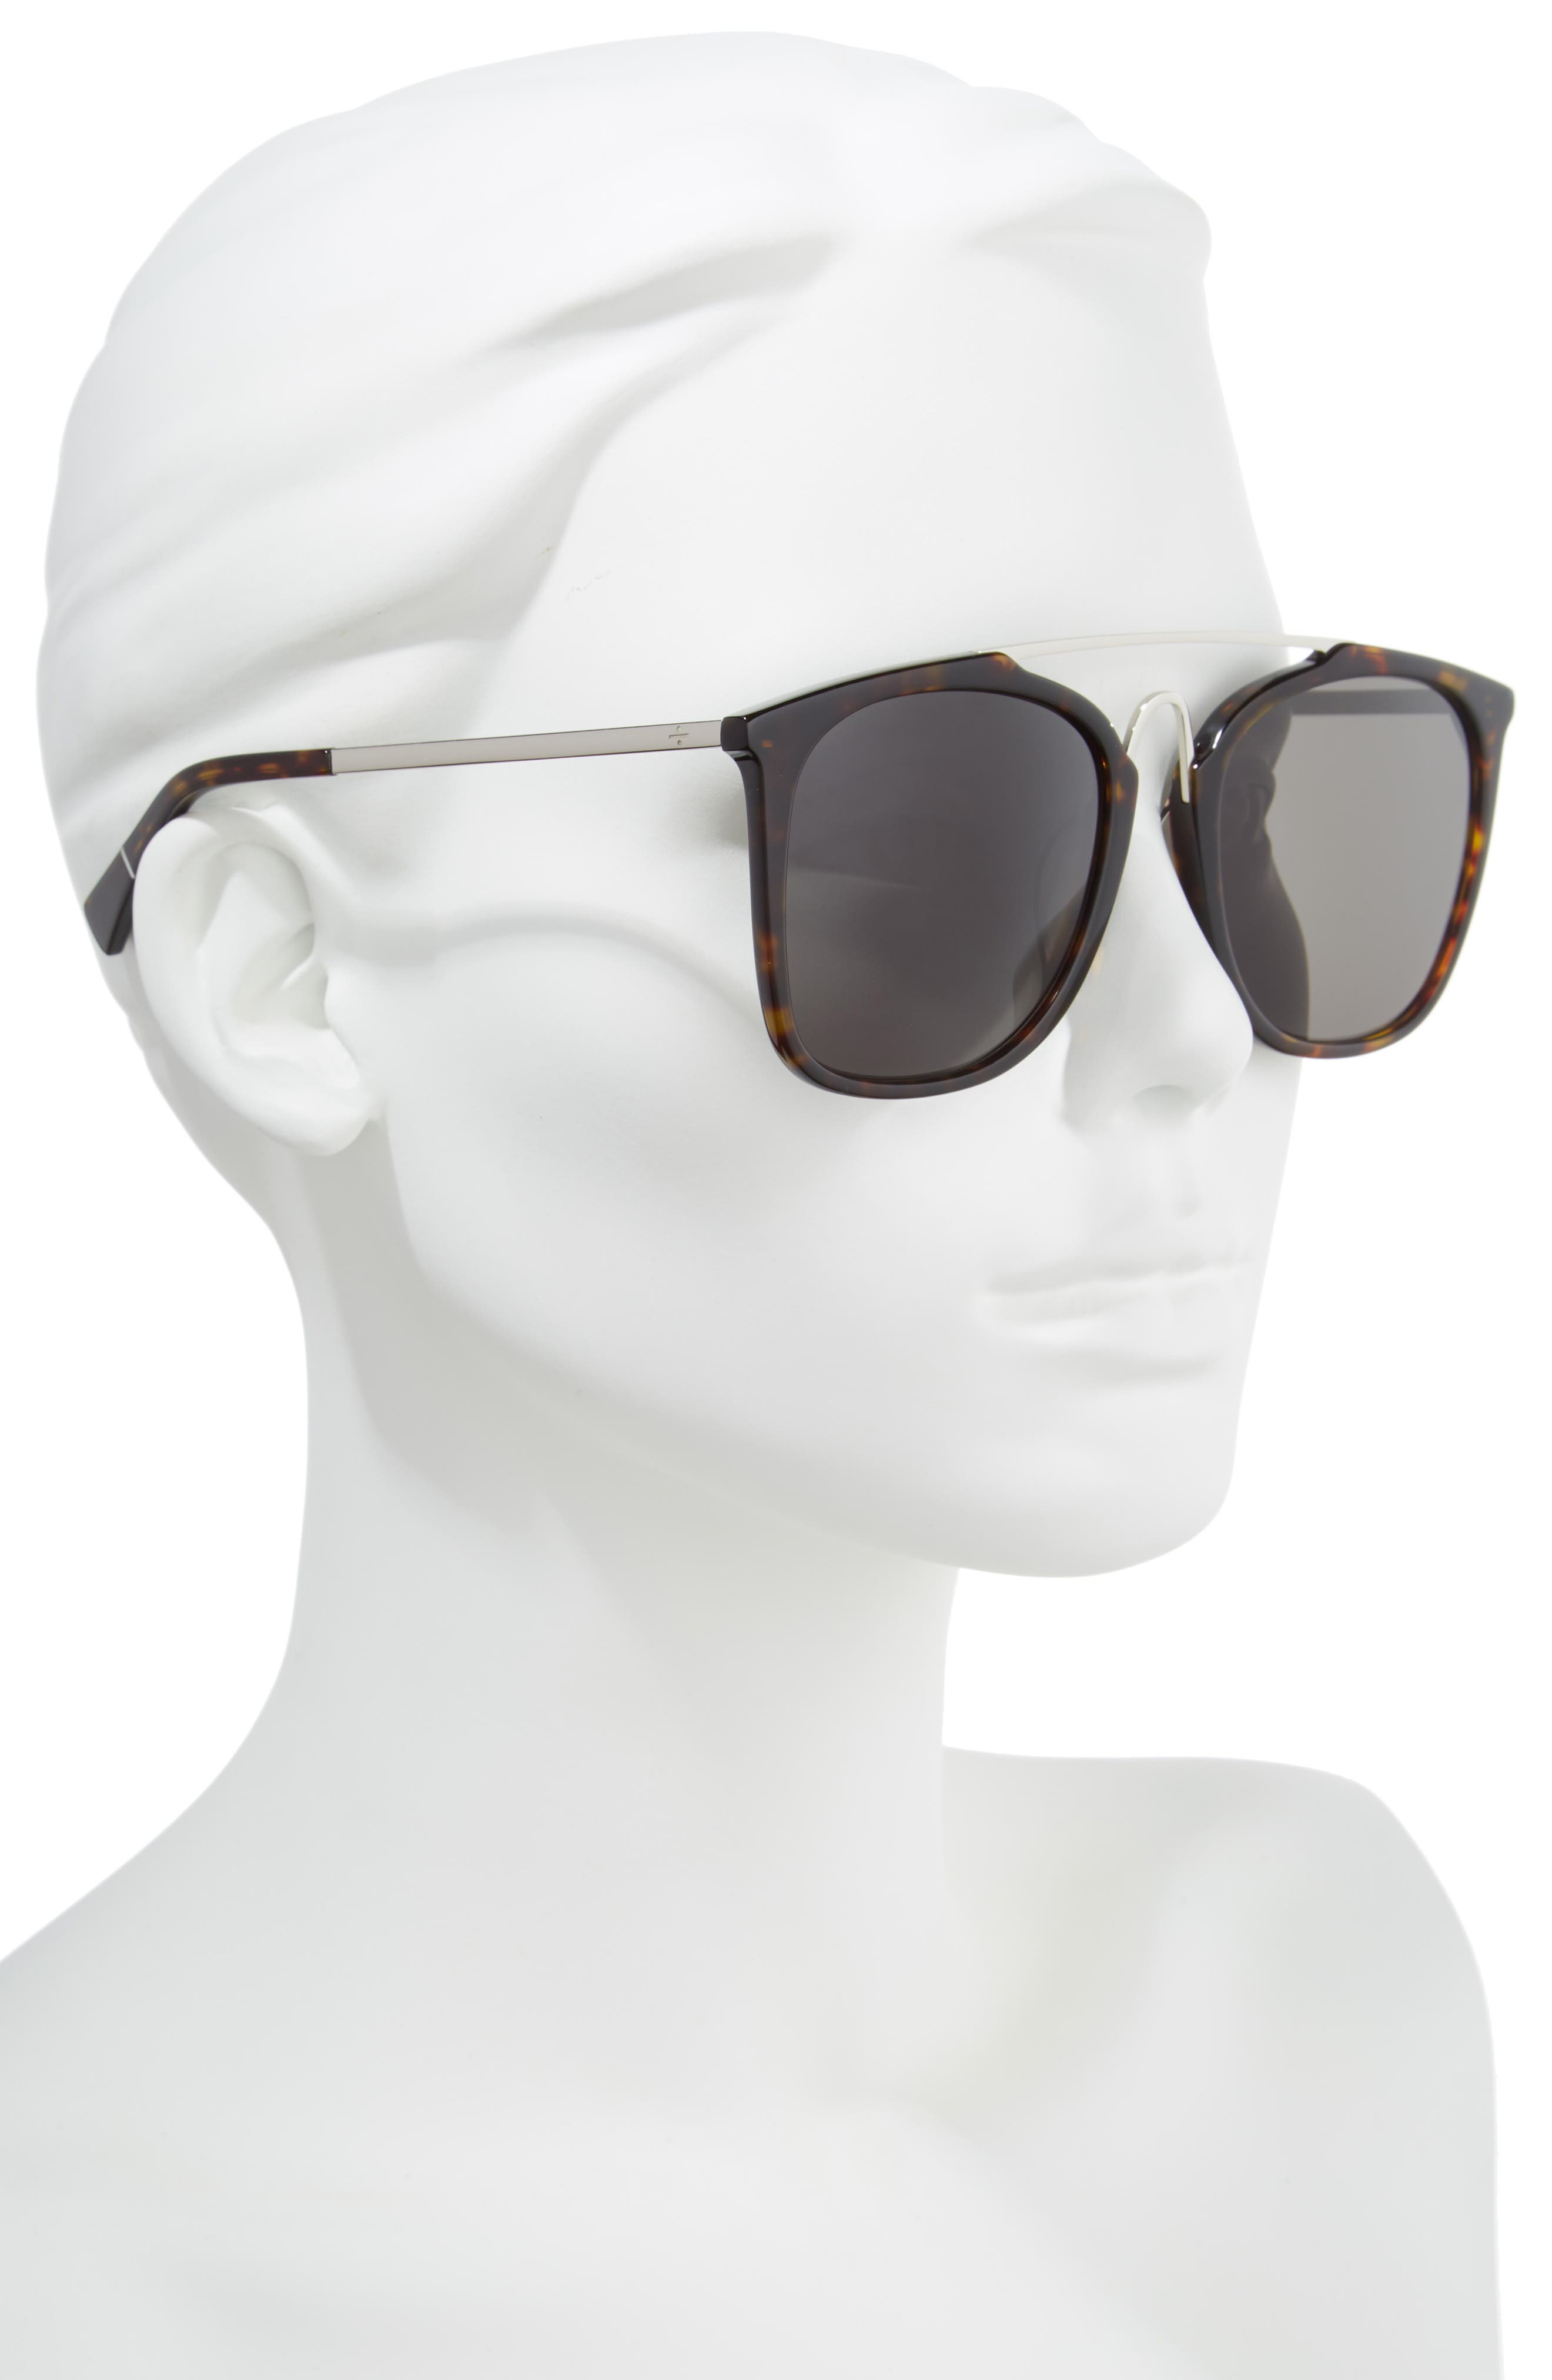 BLANC & ECLARE Bangkok 57mm Polarized Sunglasses,                             Alternate thumbnail 4, color,